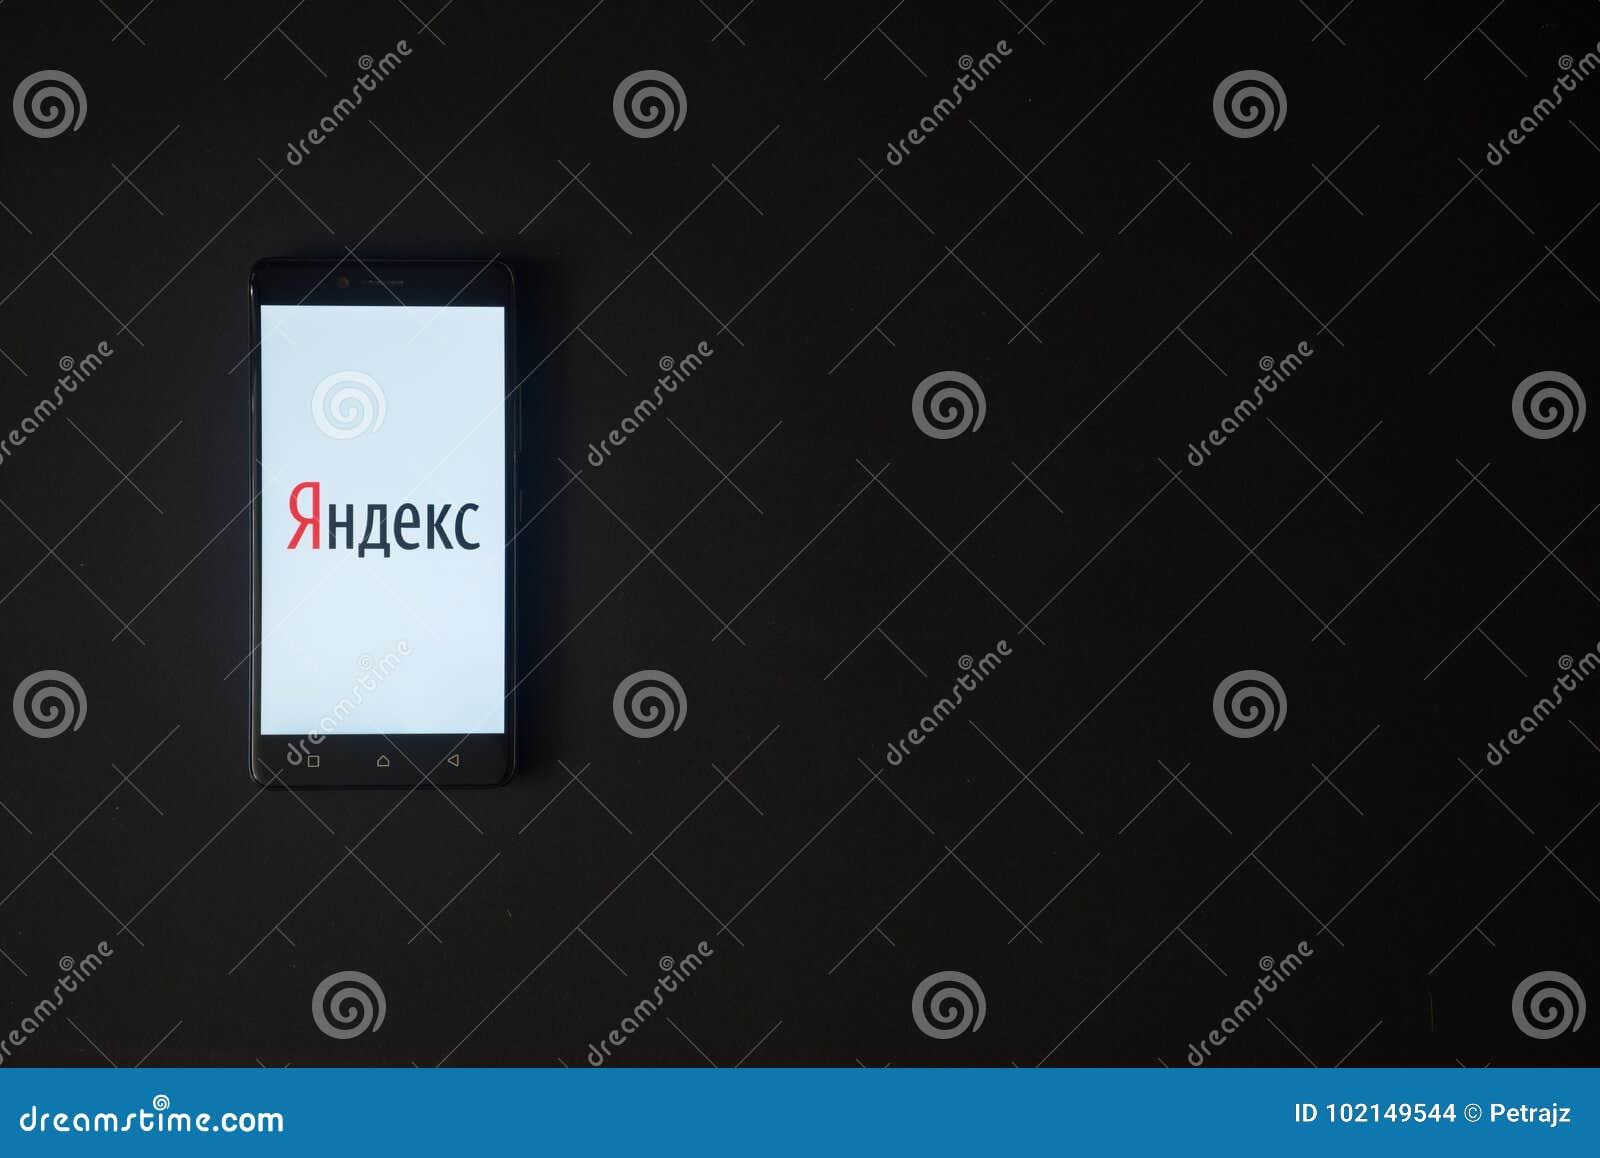 Yandex Logo On Smartphone Screen On Black Background  Editorial